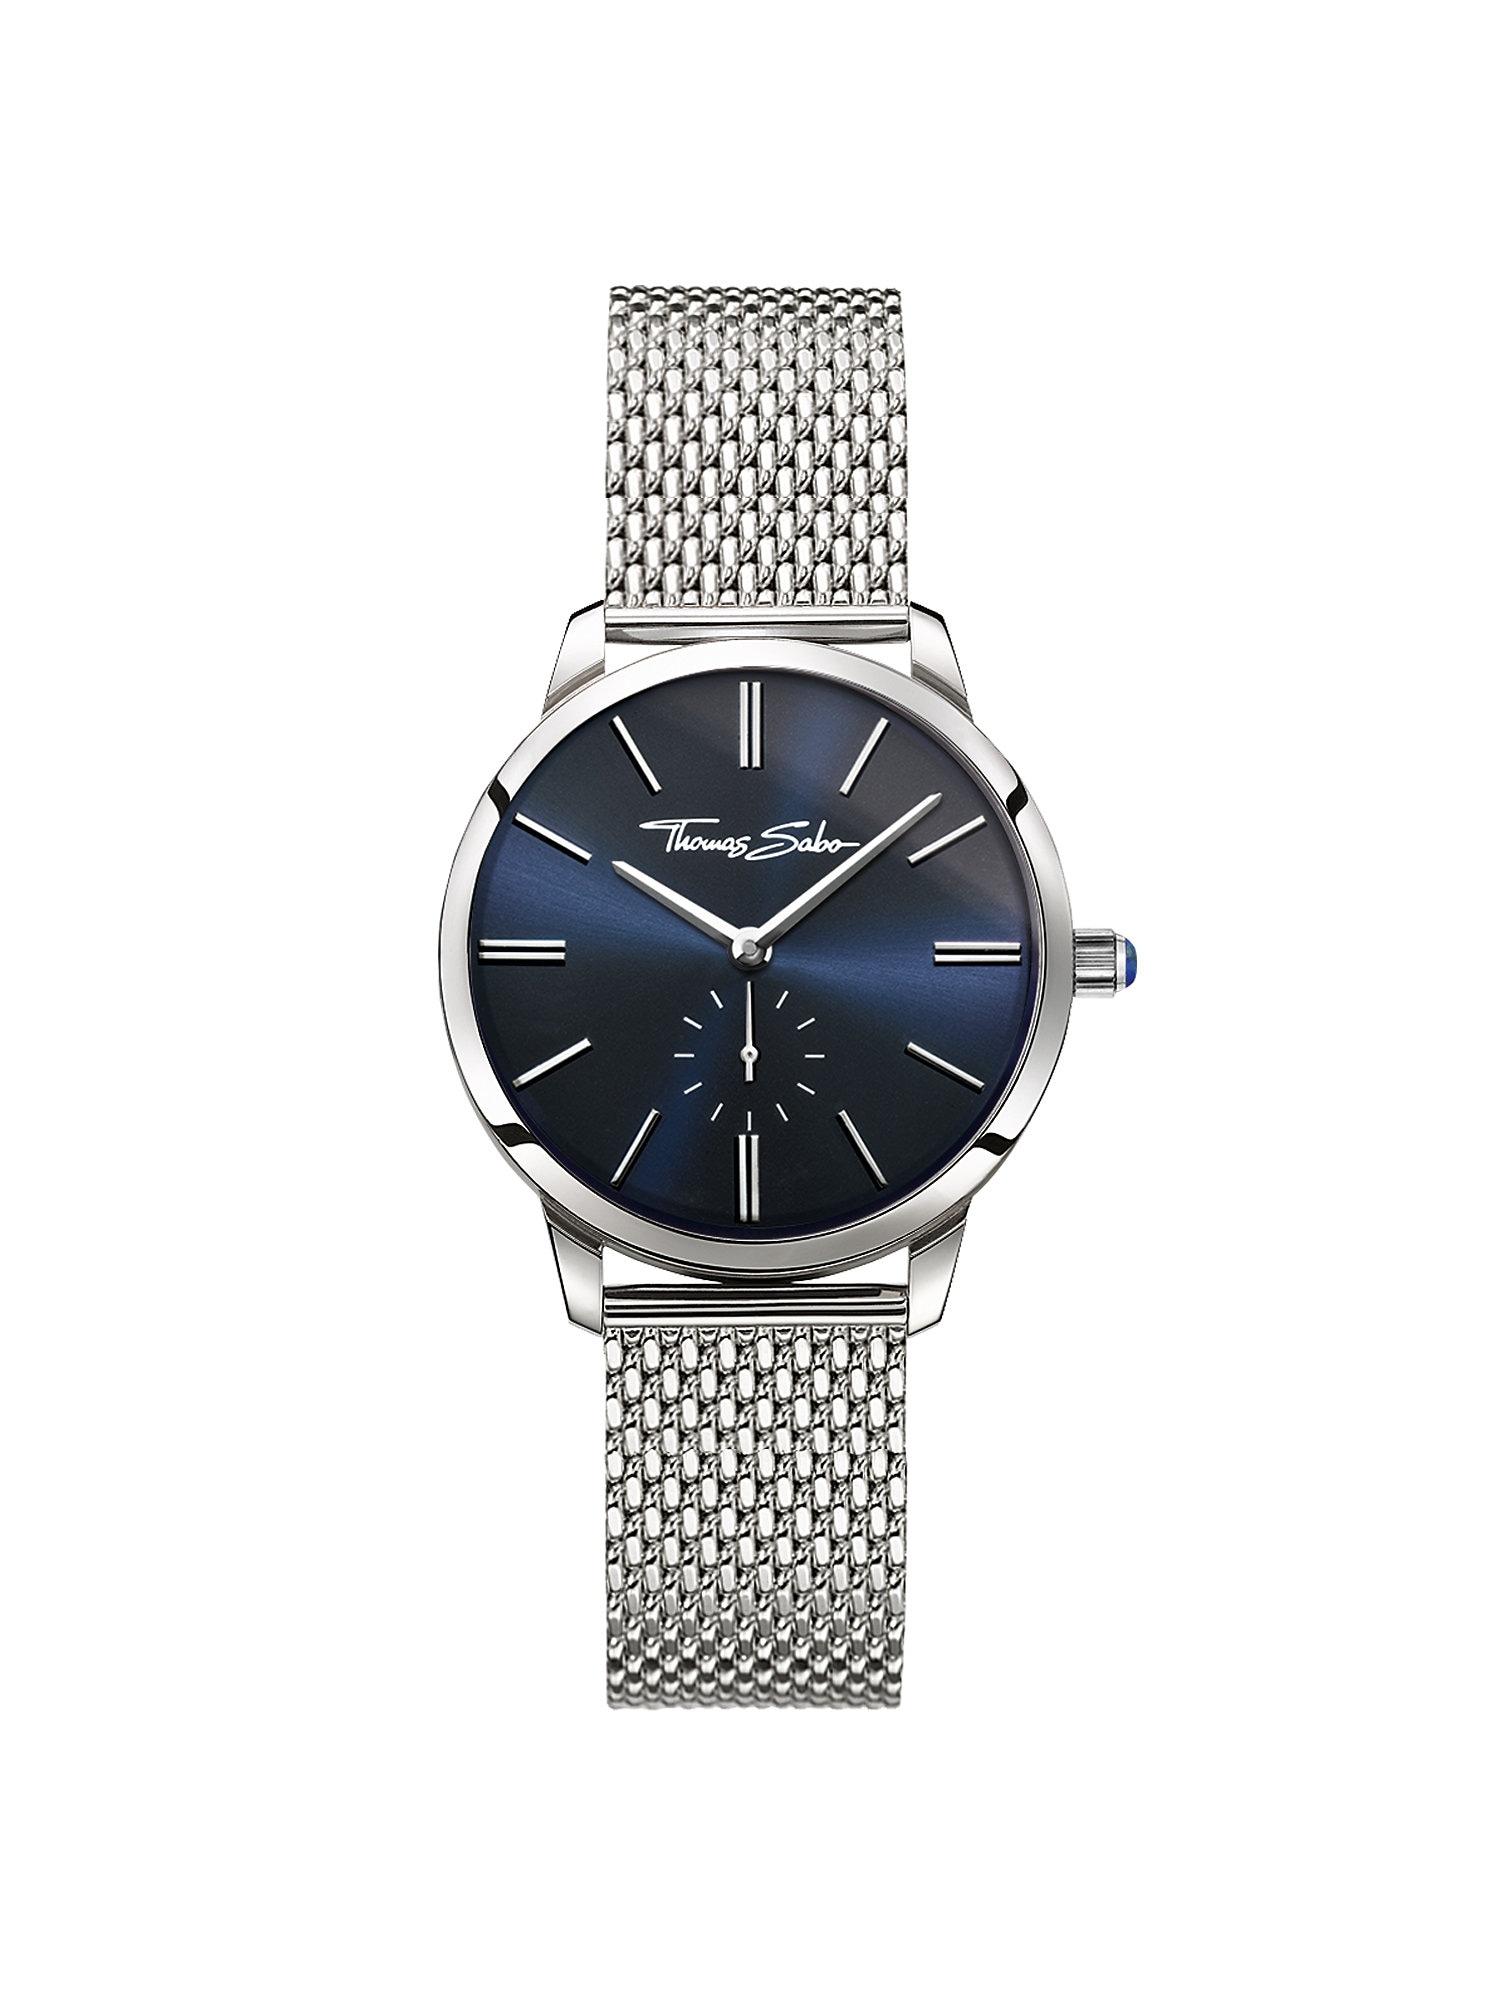 Quarzuhr 'WA0301-201-209-33 mm' | Uhren > Quarzuhren | Silber | Thomas Sabo